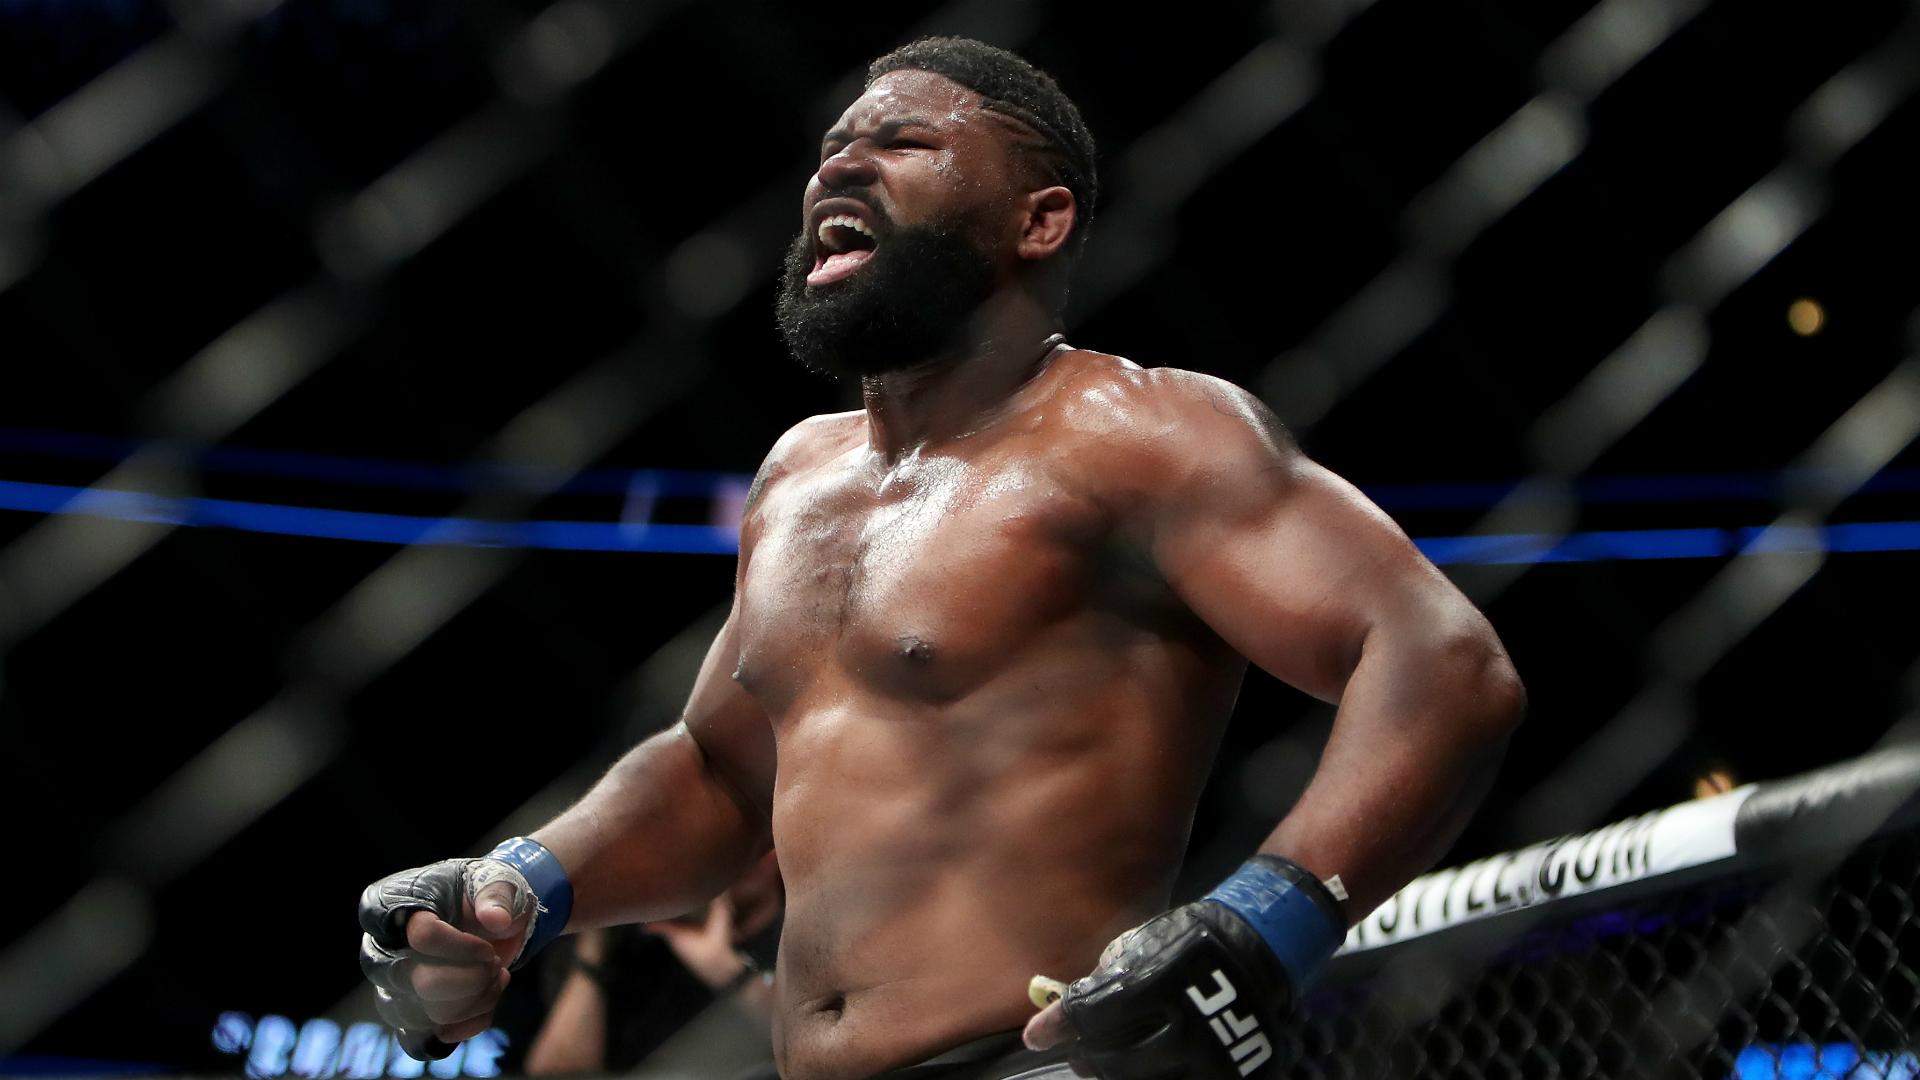 UFC 242: Curtis Blaydes determined to enhance title credentials in Abu Dhabi